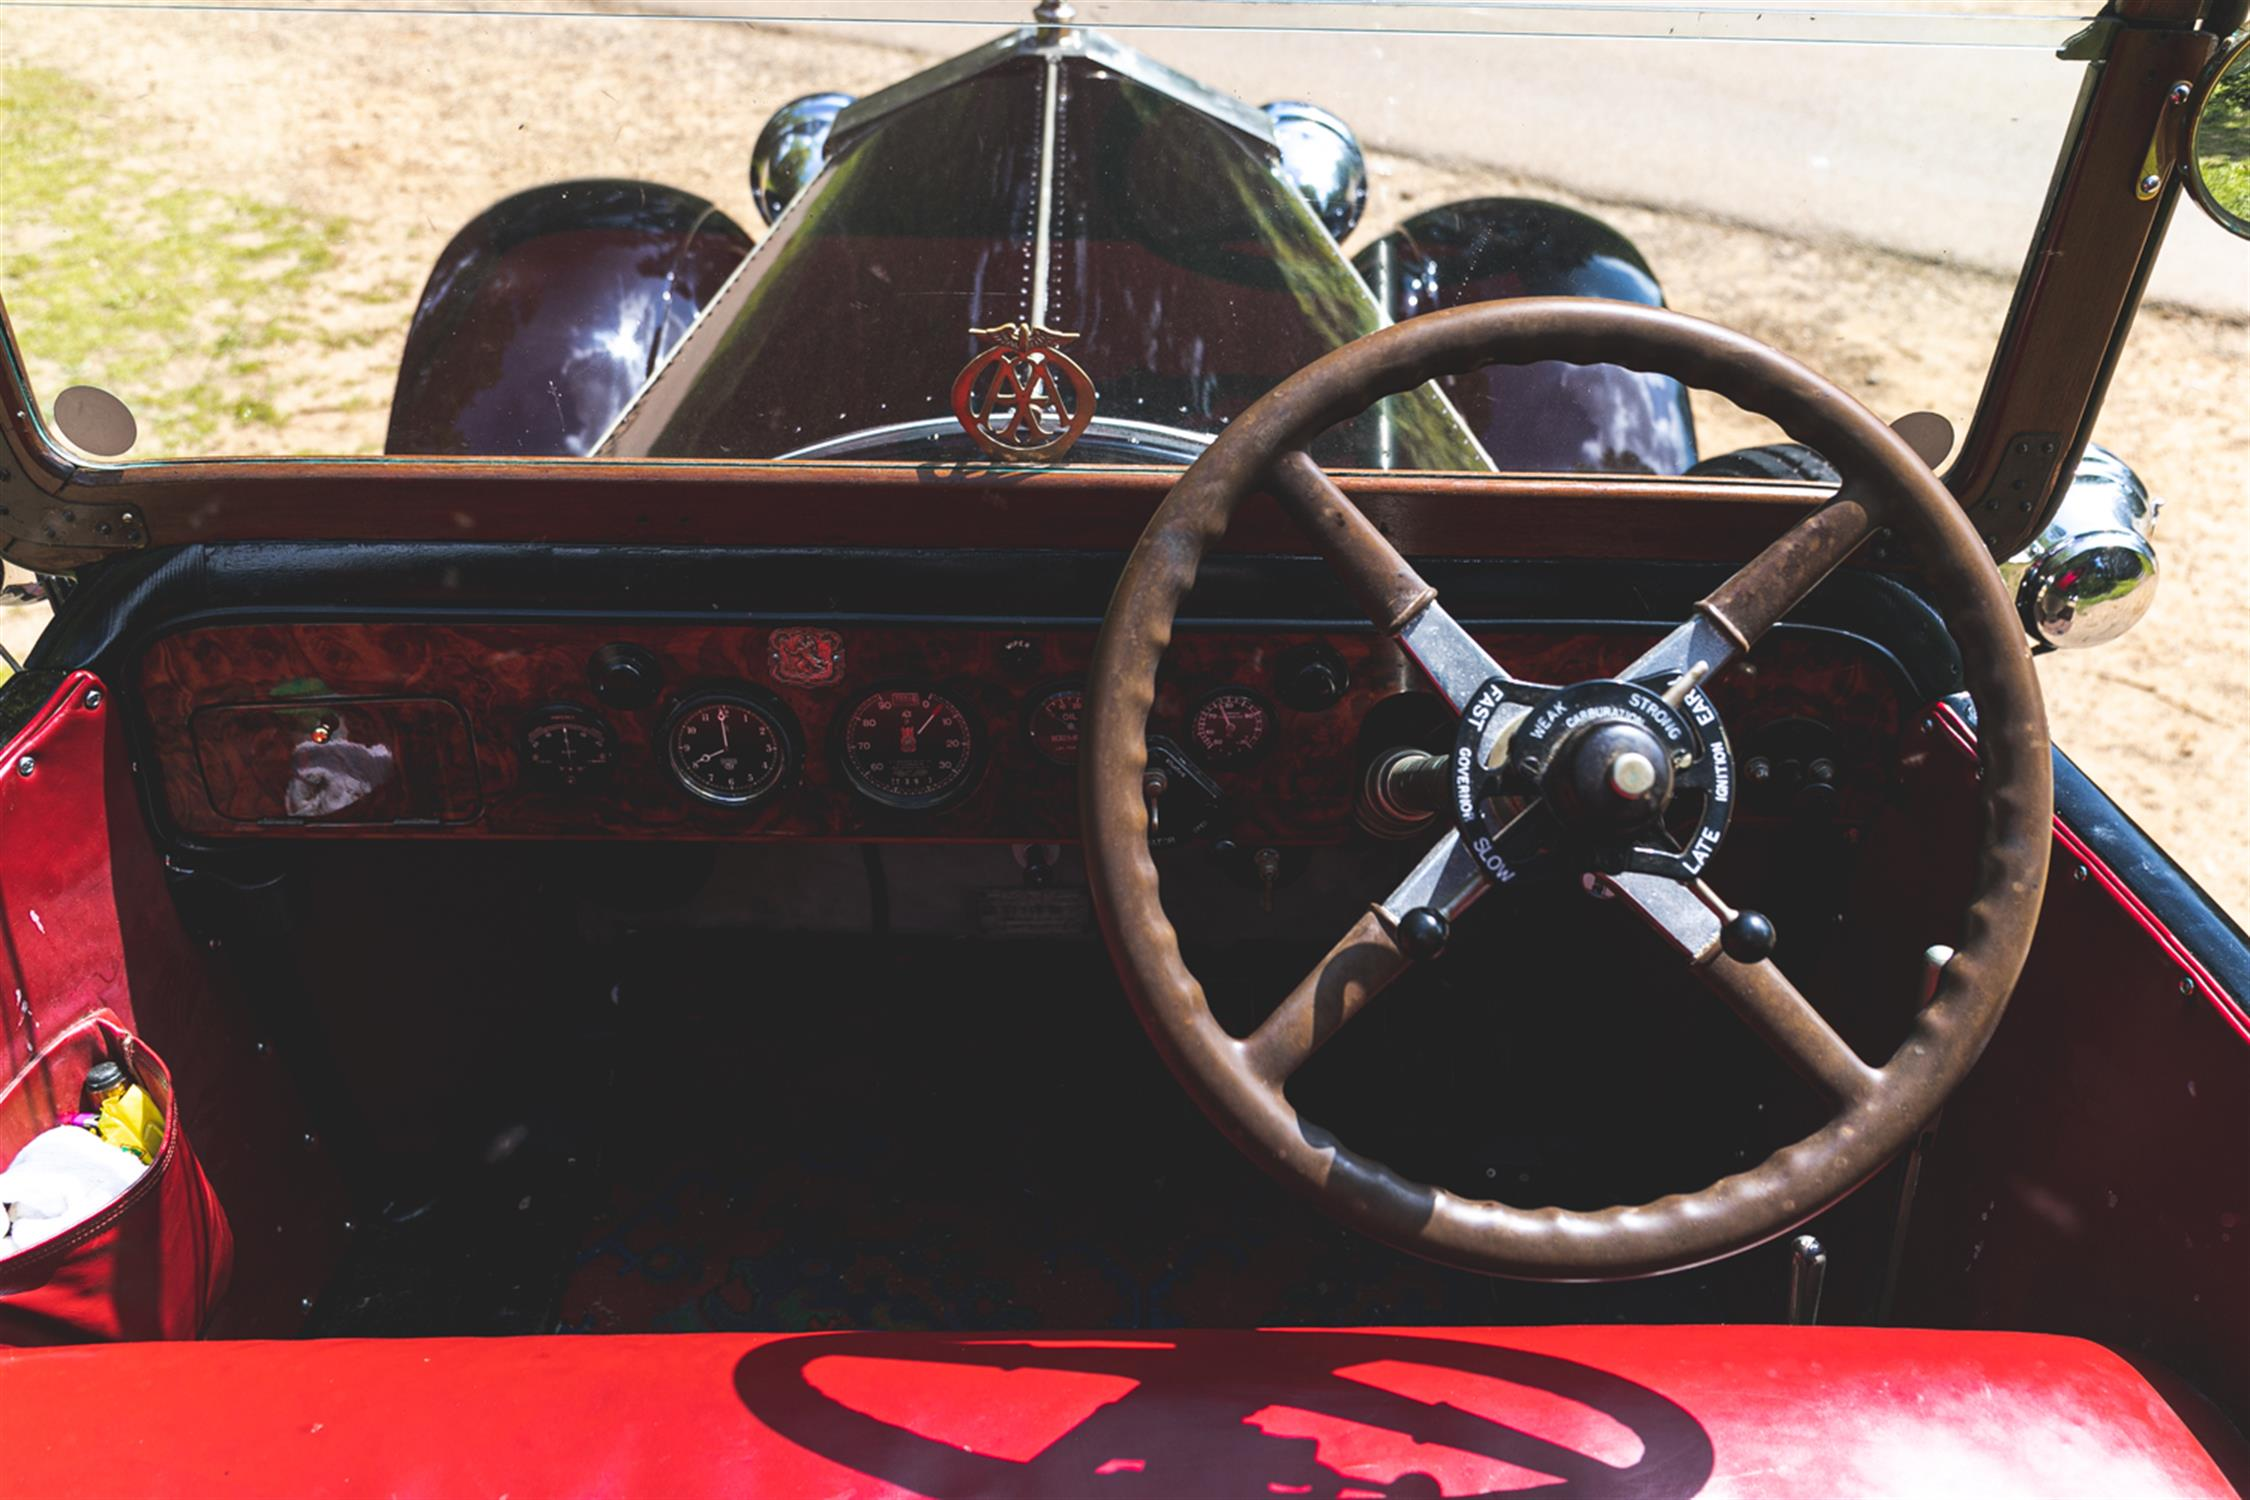 1927 Rolls-Royce Phantom 1 Open Tourer - Image 3 of 10